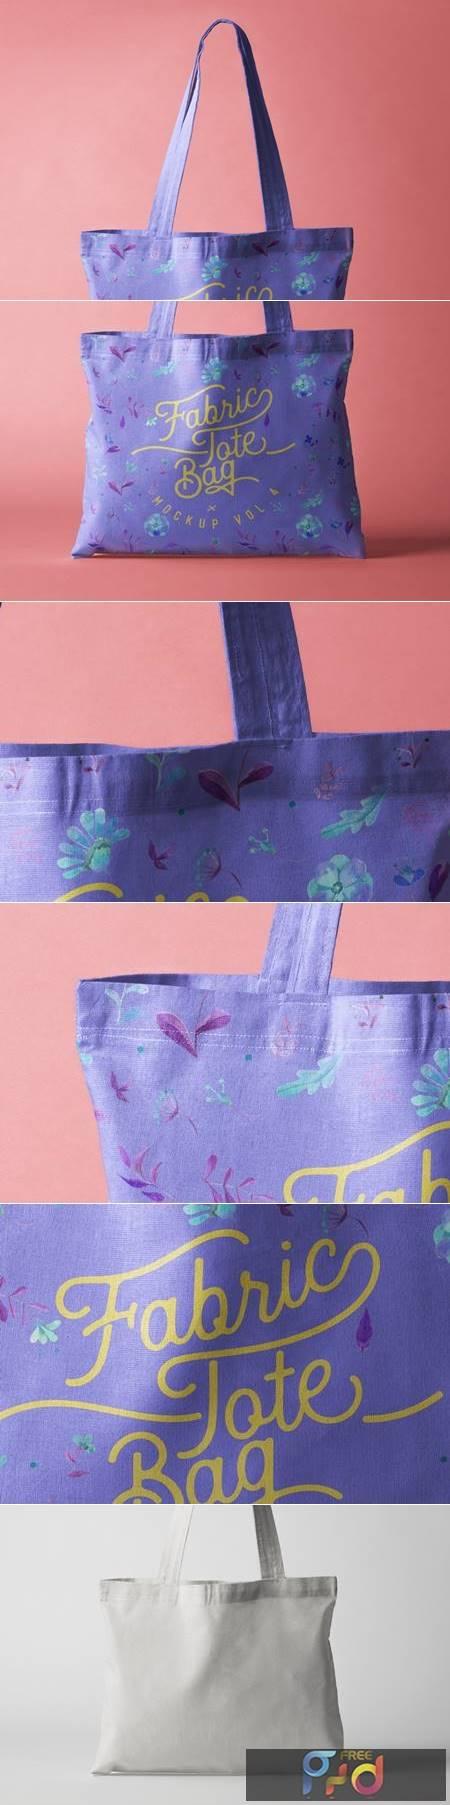 Psd Tote Bag Fabric Mockup Vol 4 1342 1